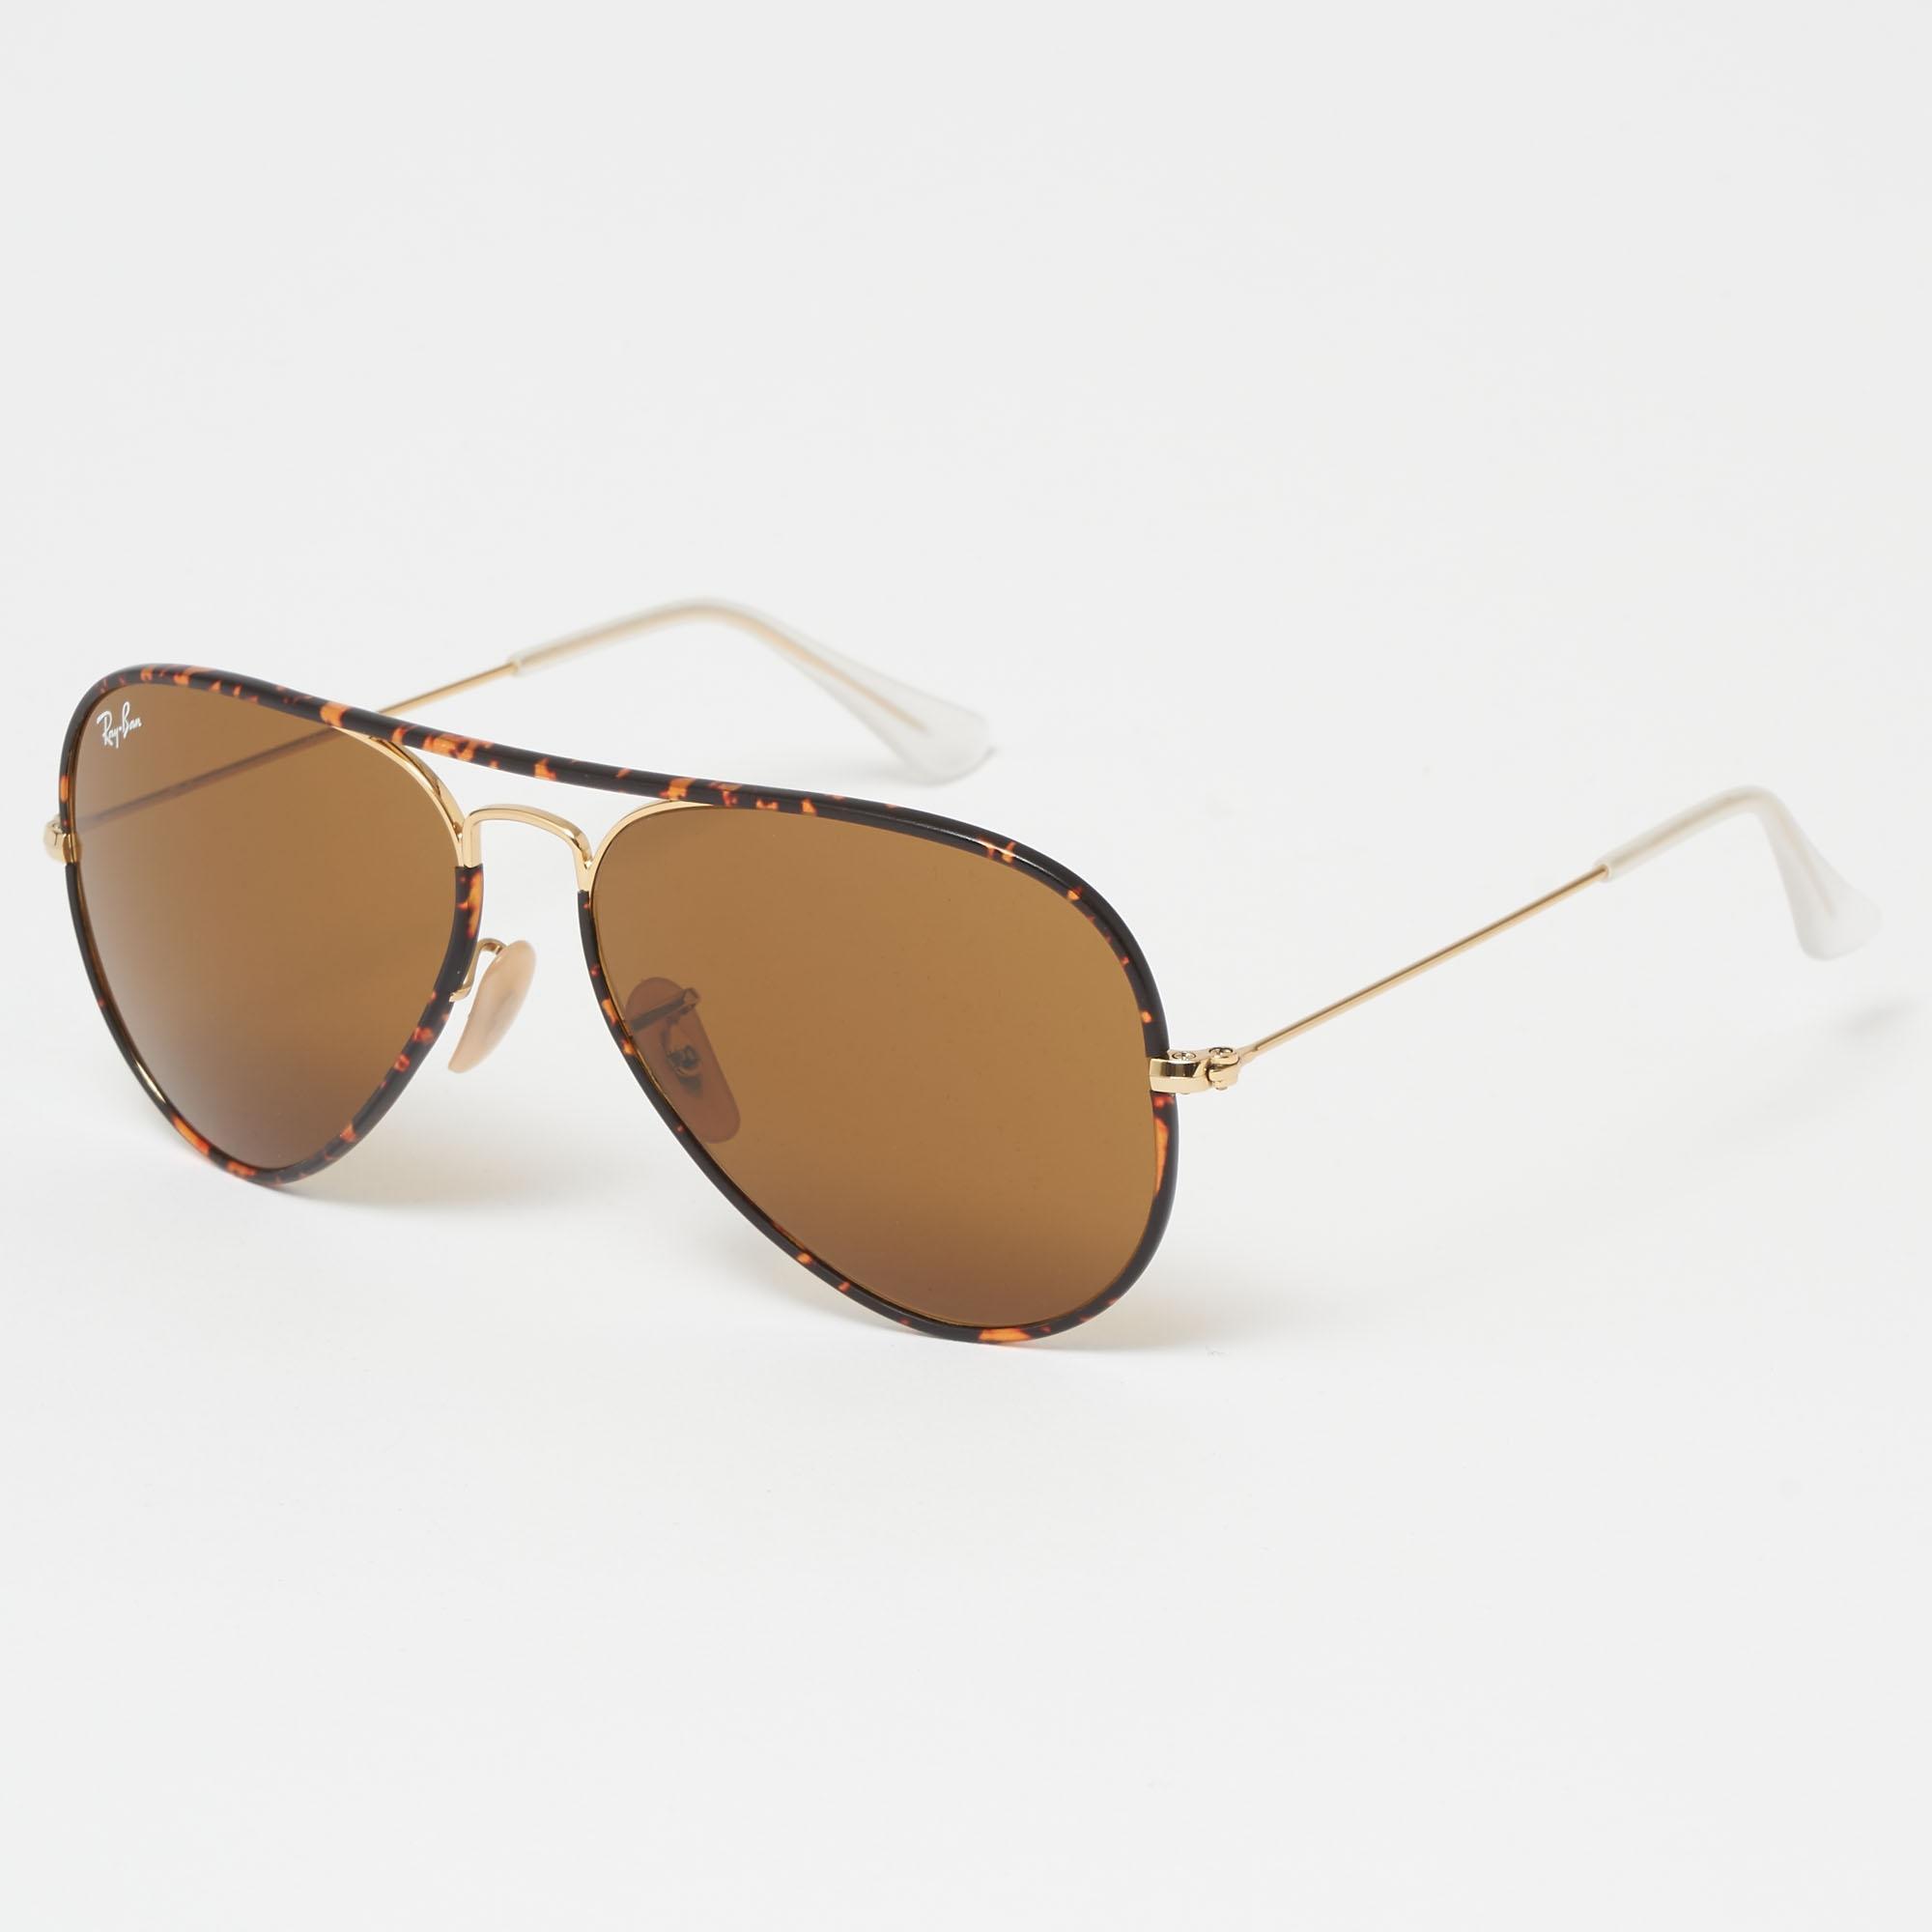 5170dc1378 Ray-Ban Tortoise Aviator Full Colour Sunglasses - Brown Classic B-15 ...